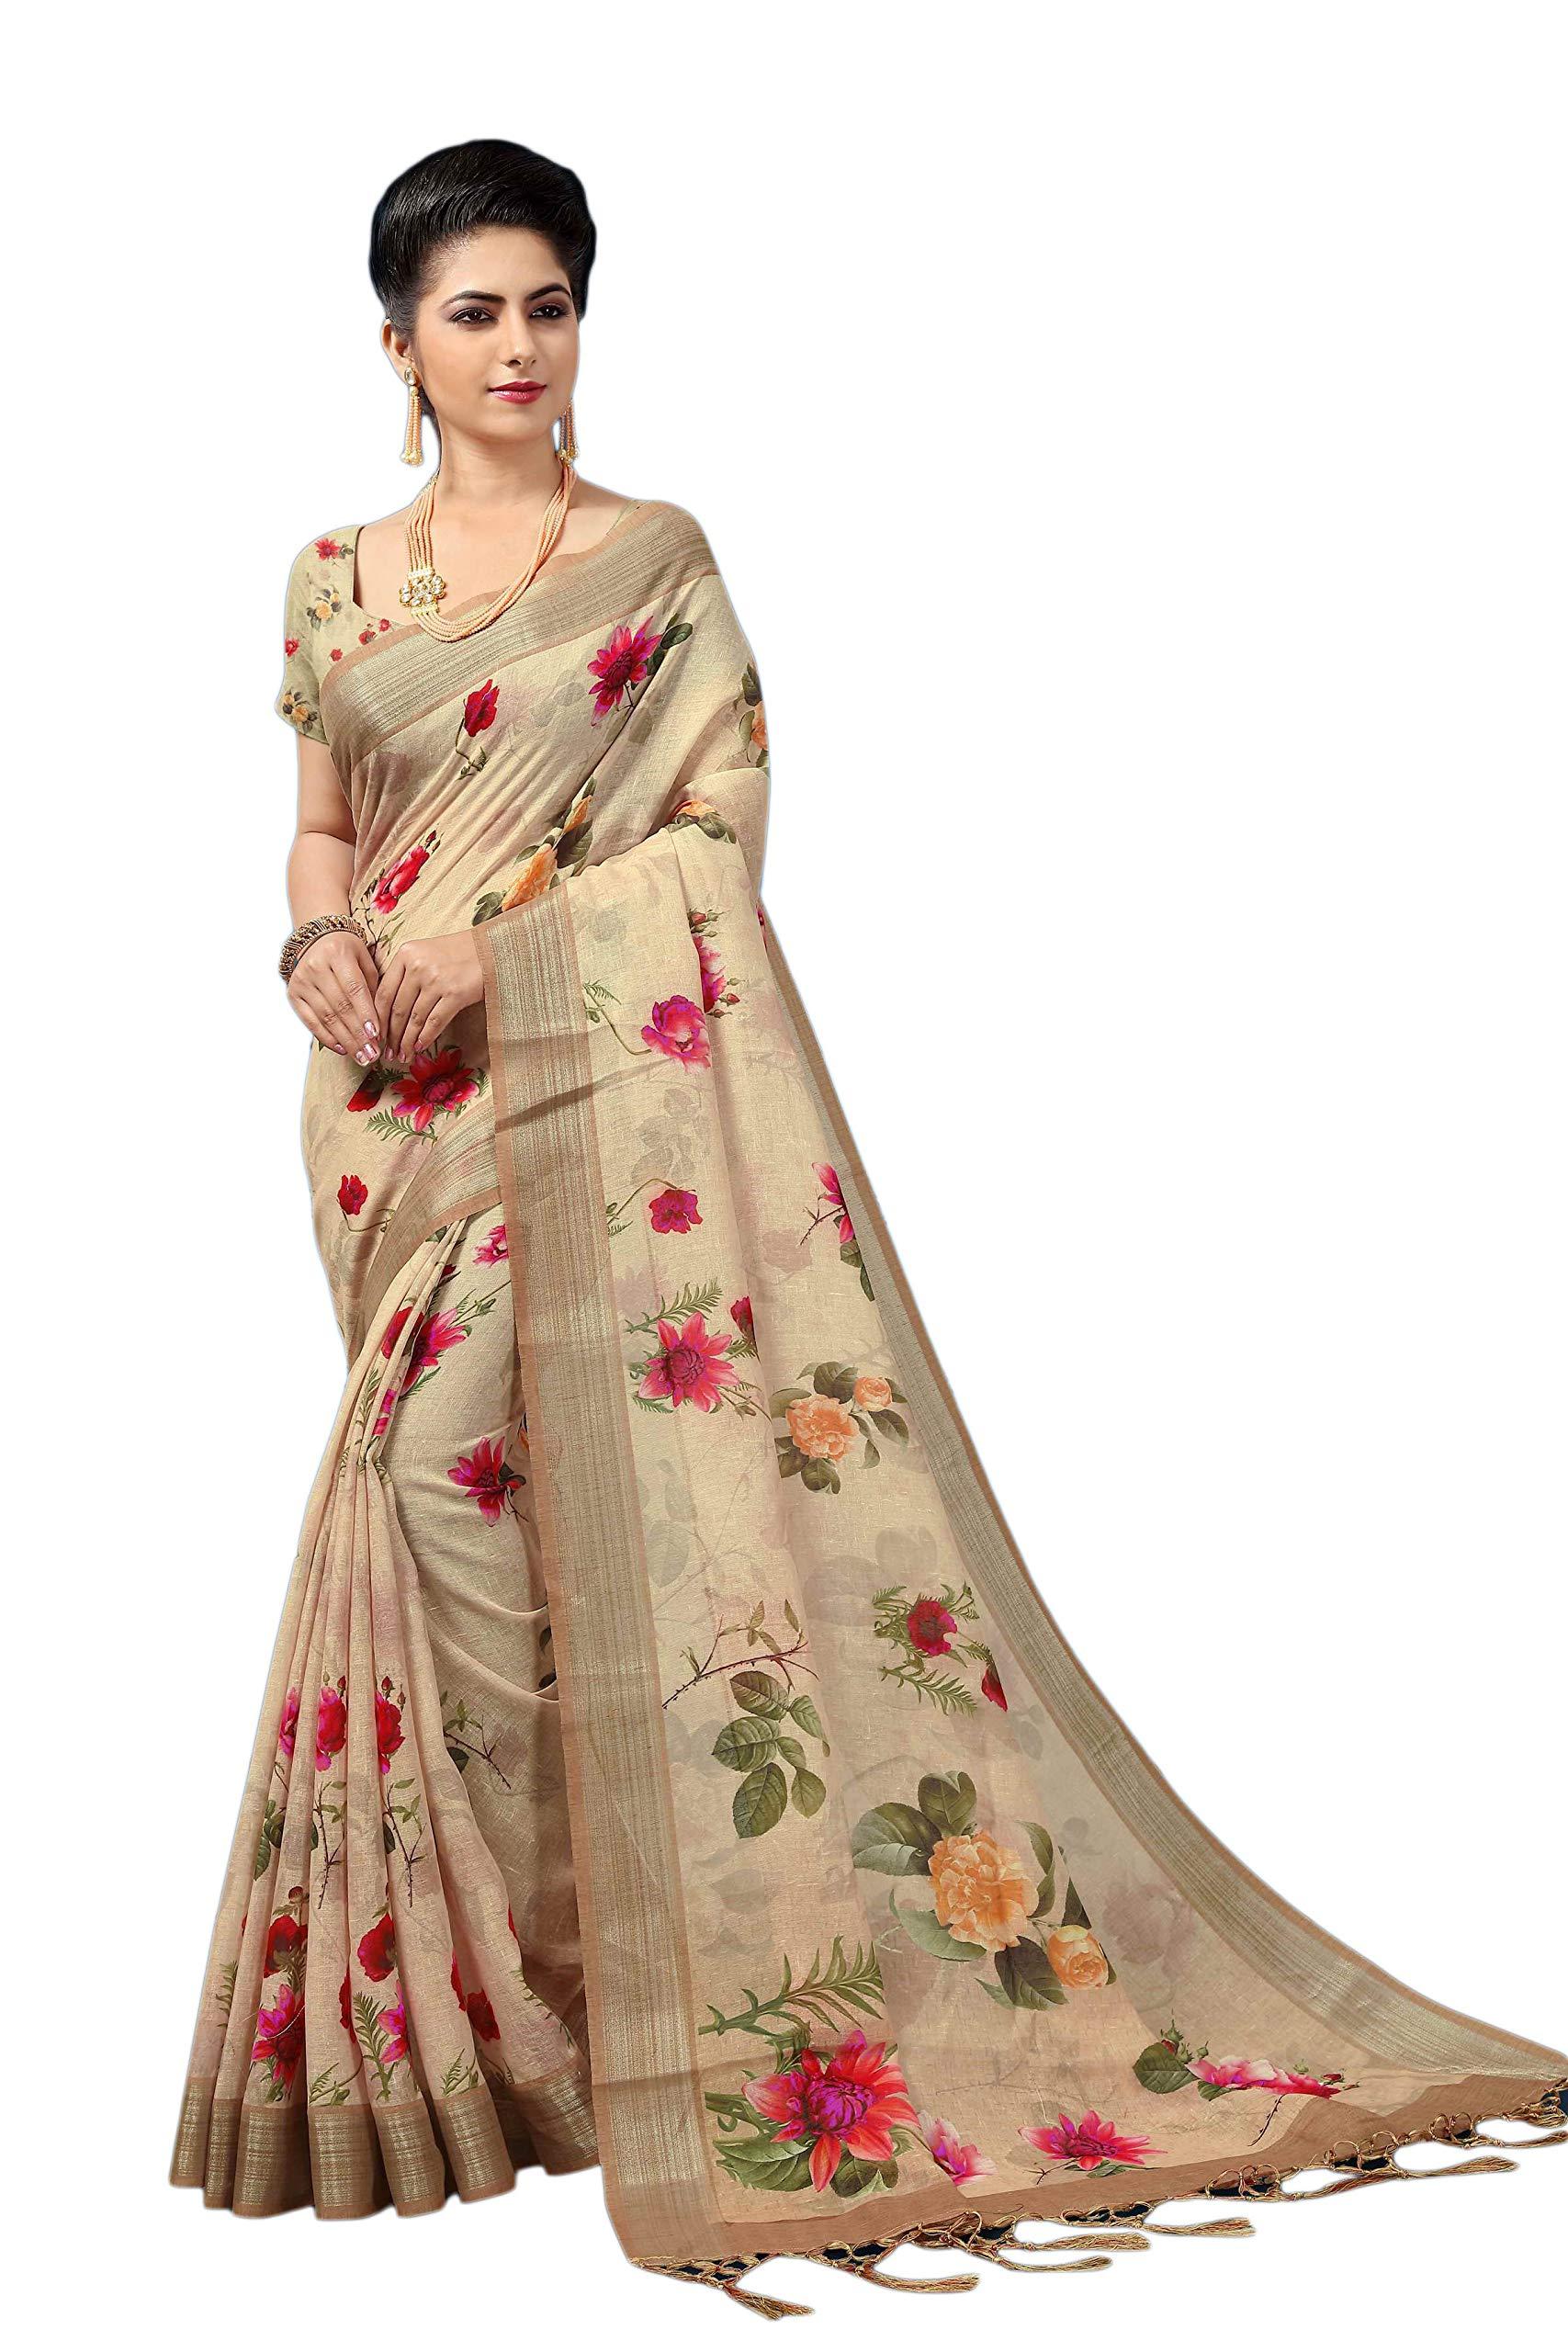 KIMANA Women's Indian Bollywood Designer Ethnic Cotton Linen Party Wear Saree S6678 Light Brown